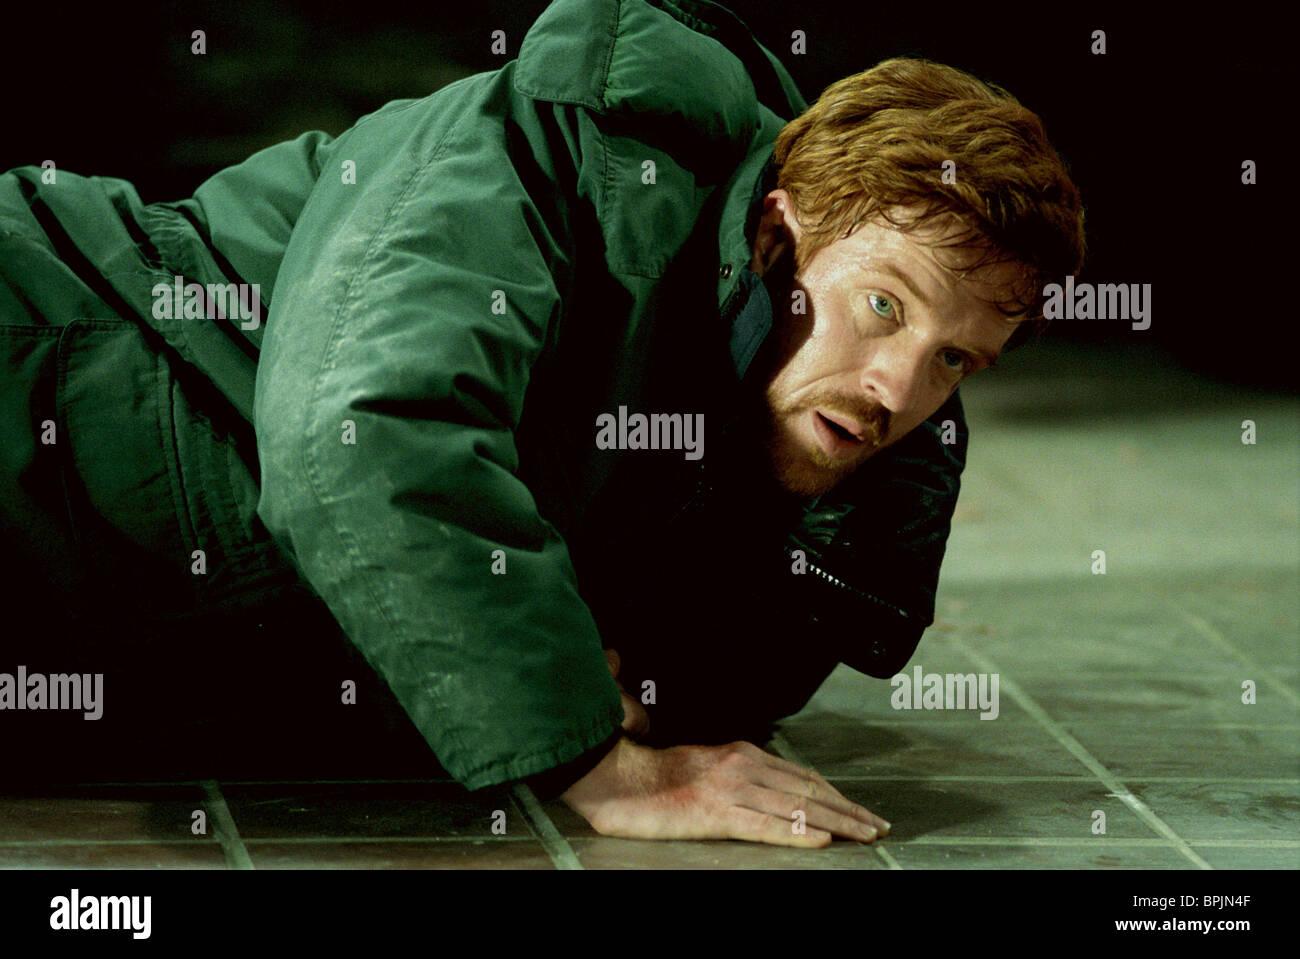 DAMIAN LEWIS DREAMCATCHER (2003) Stock Photo